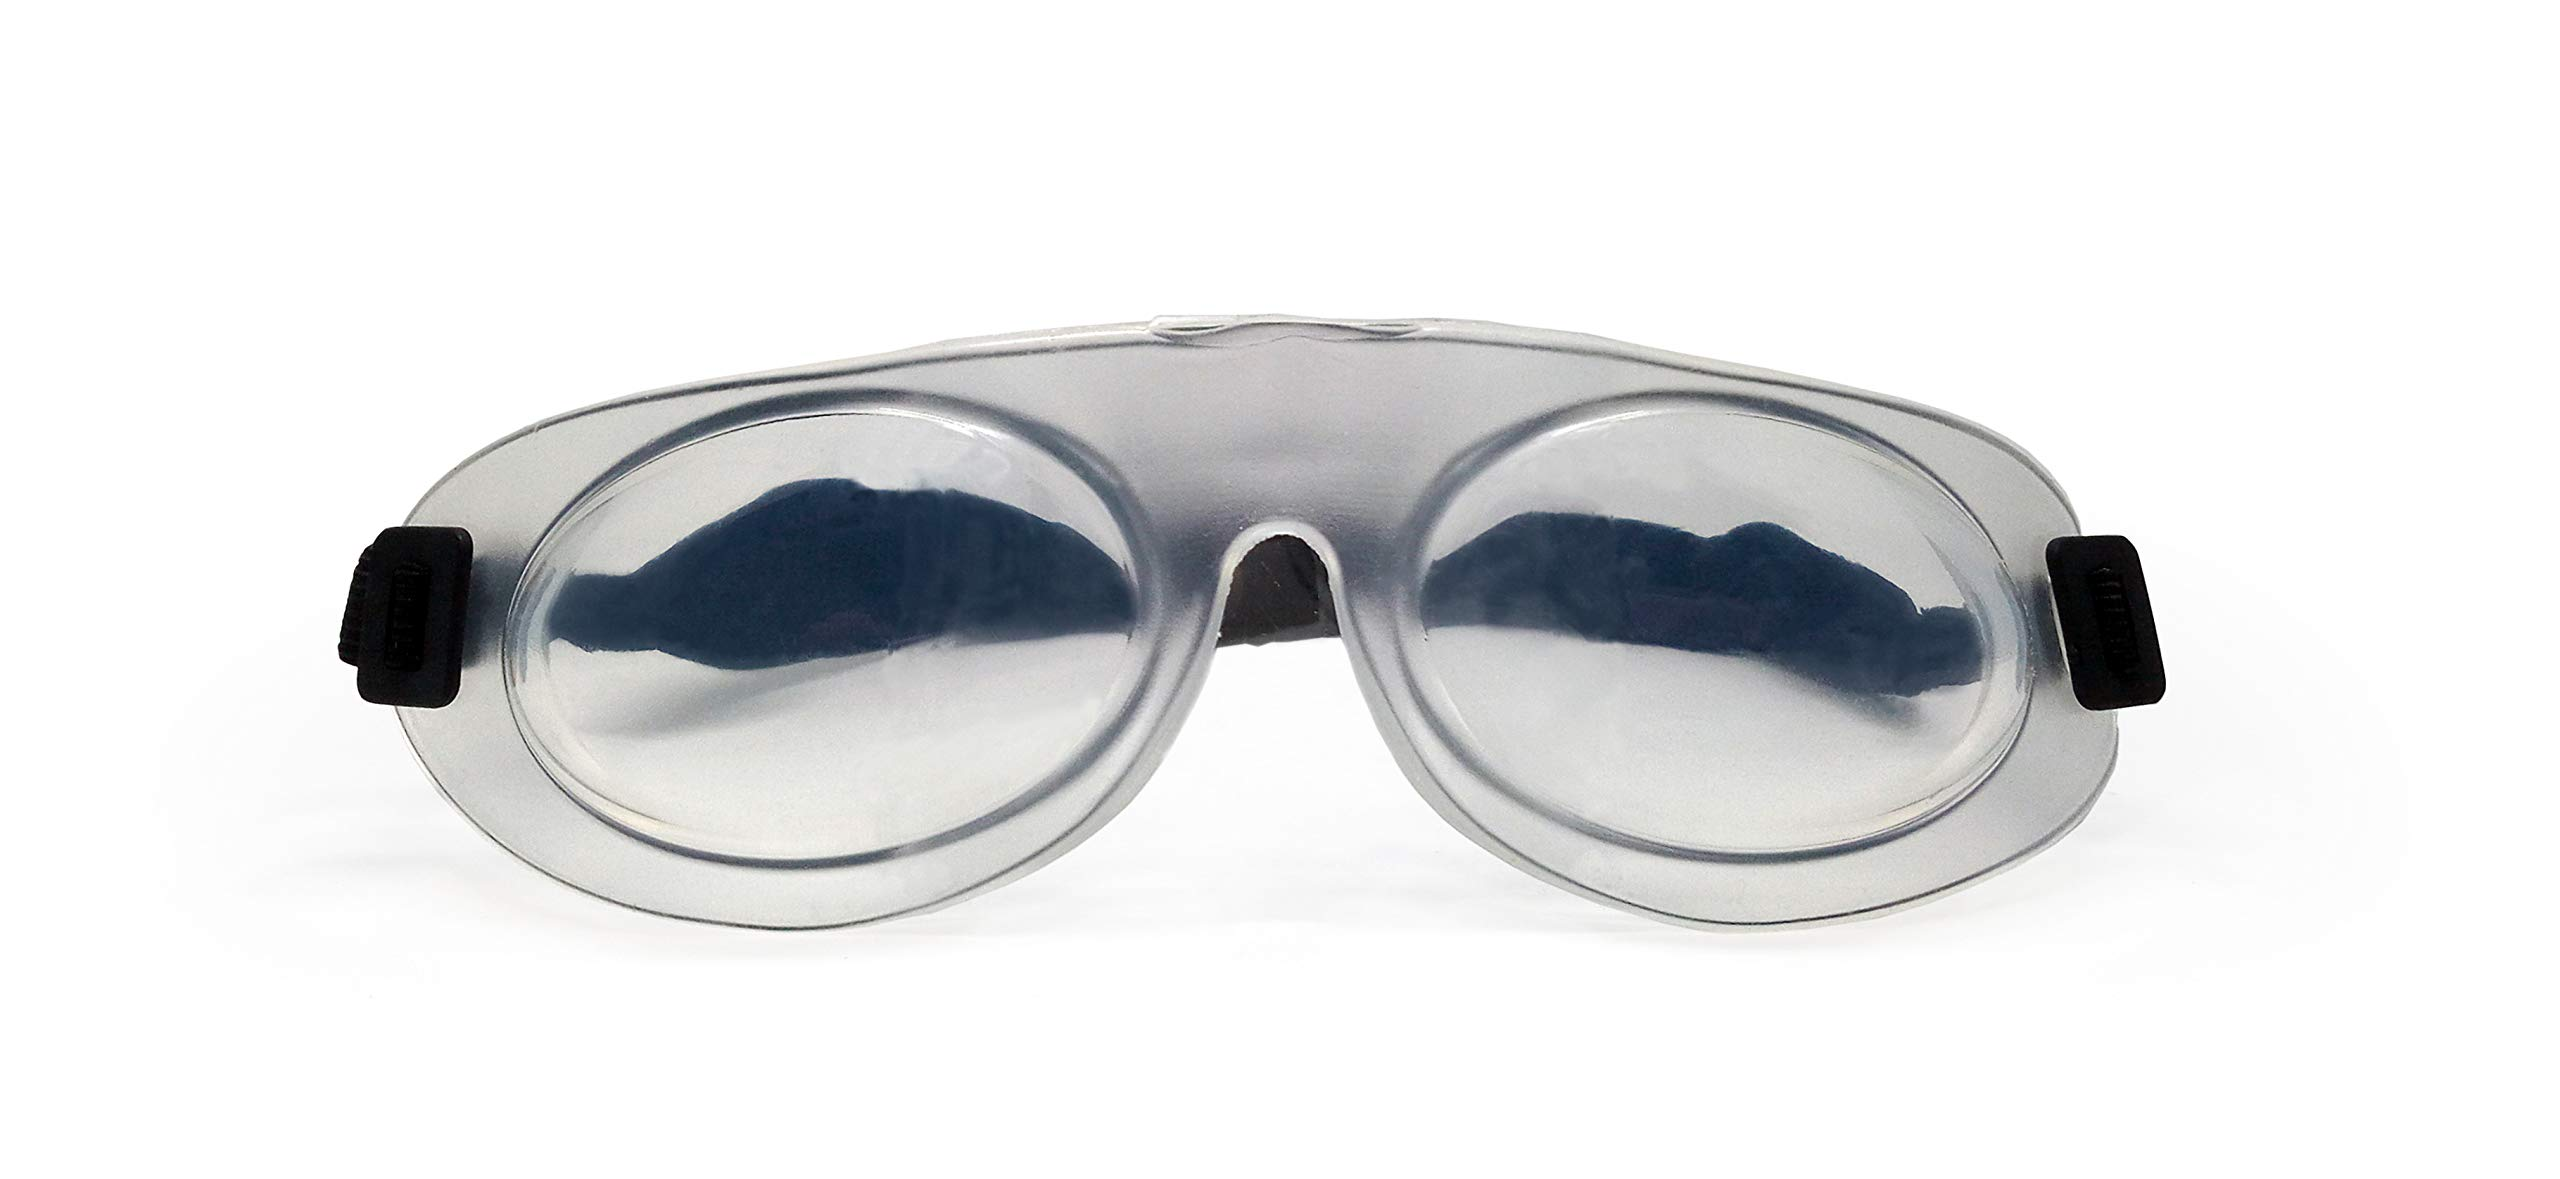 Eyeseals 4.0 Hydrating Sleep Mask for Nighttime Dry Eye Relief (Clear) by EYEECO